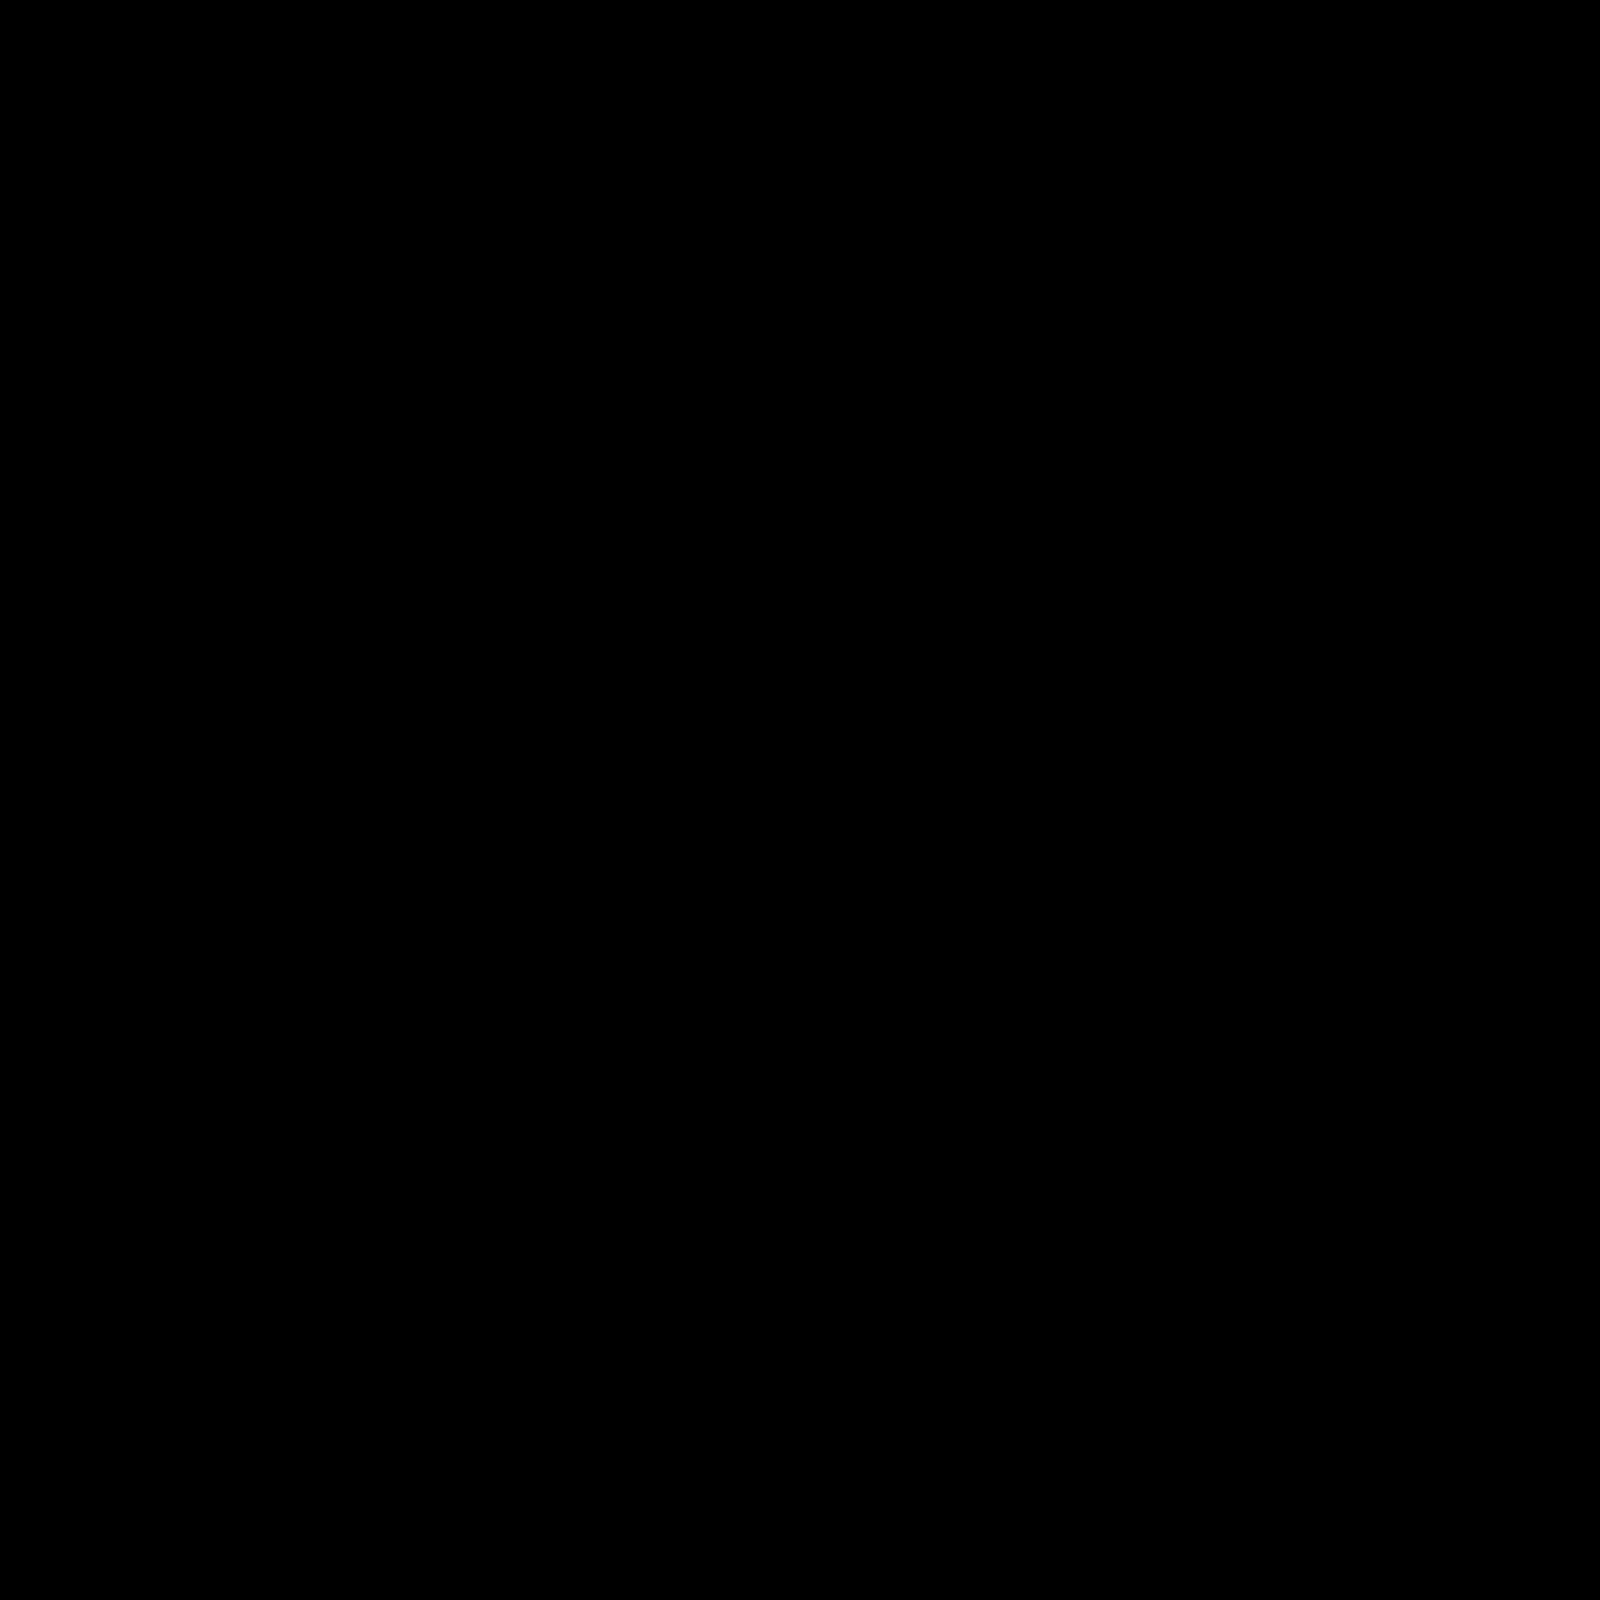 AM Radio Filled icon